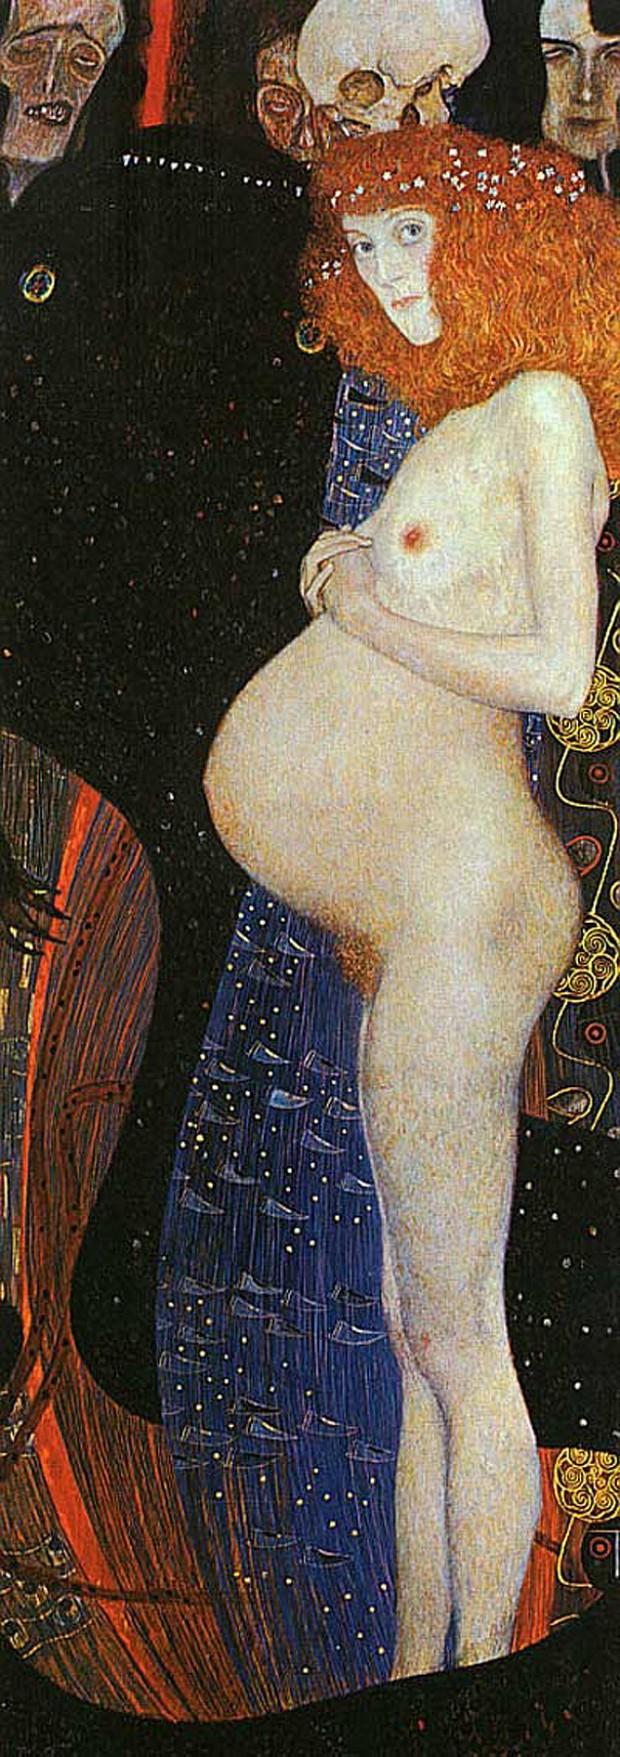 The Hope 1 (1903) - Klimt - National Gallery of Art   Ottawa (Reprodução)